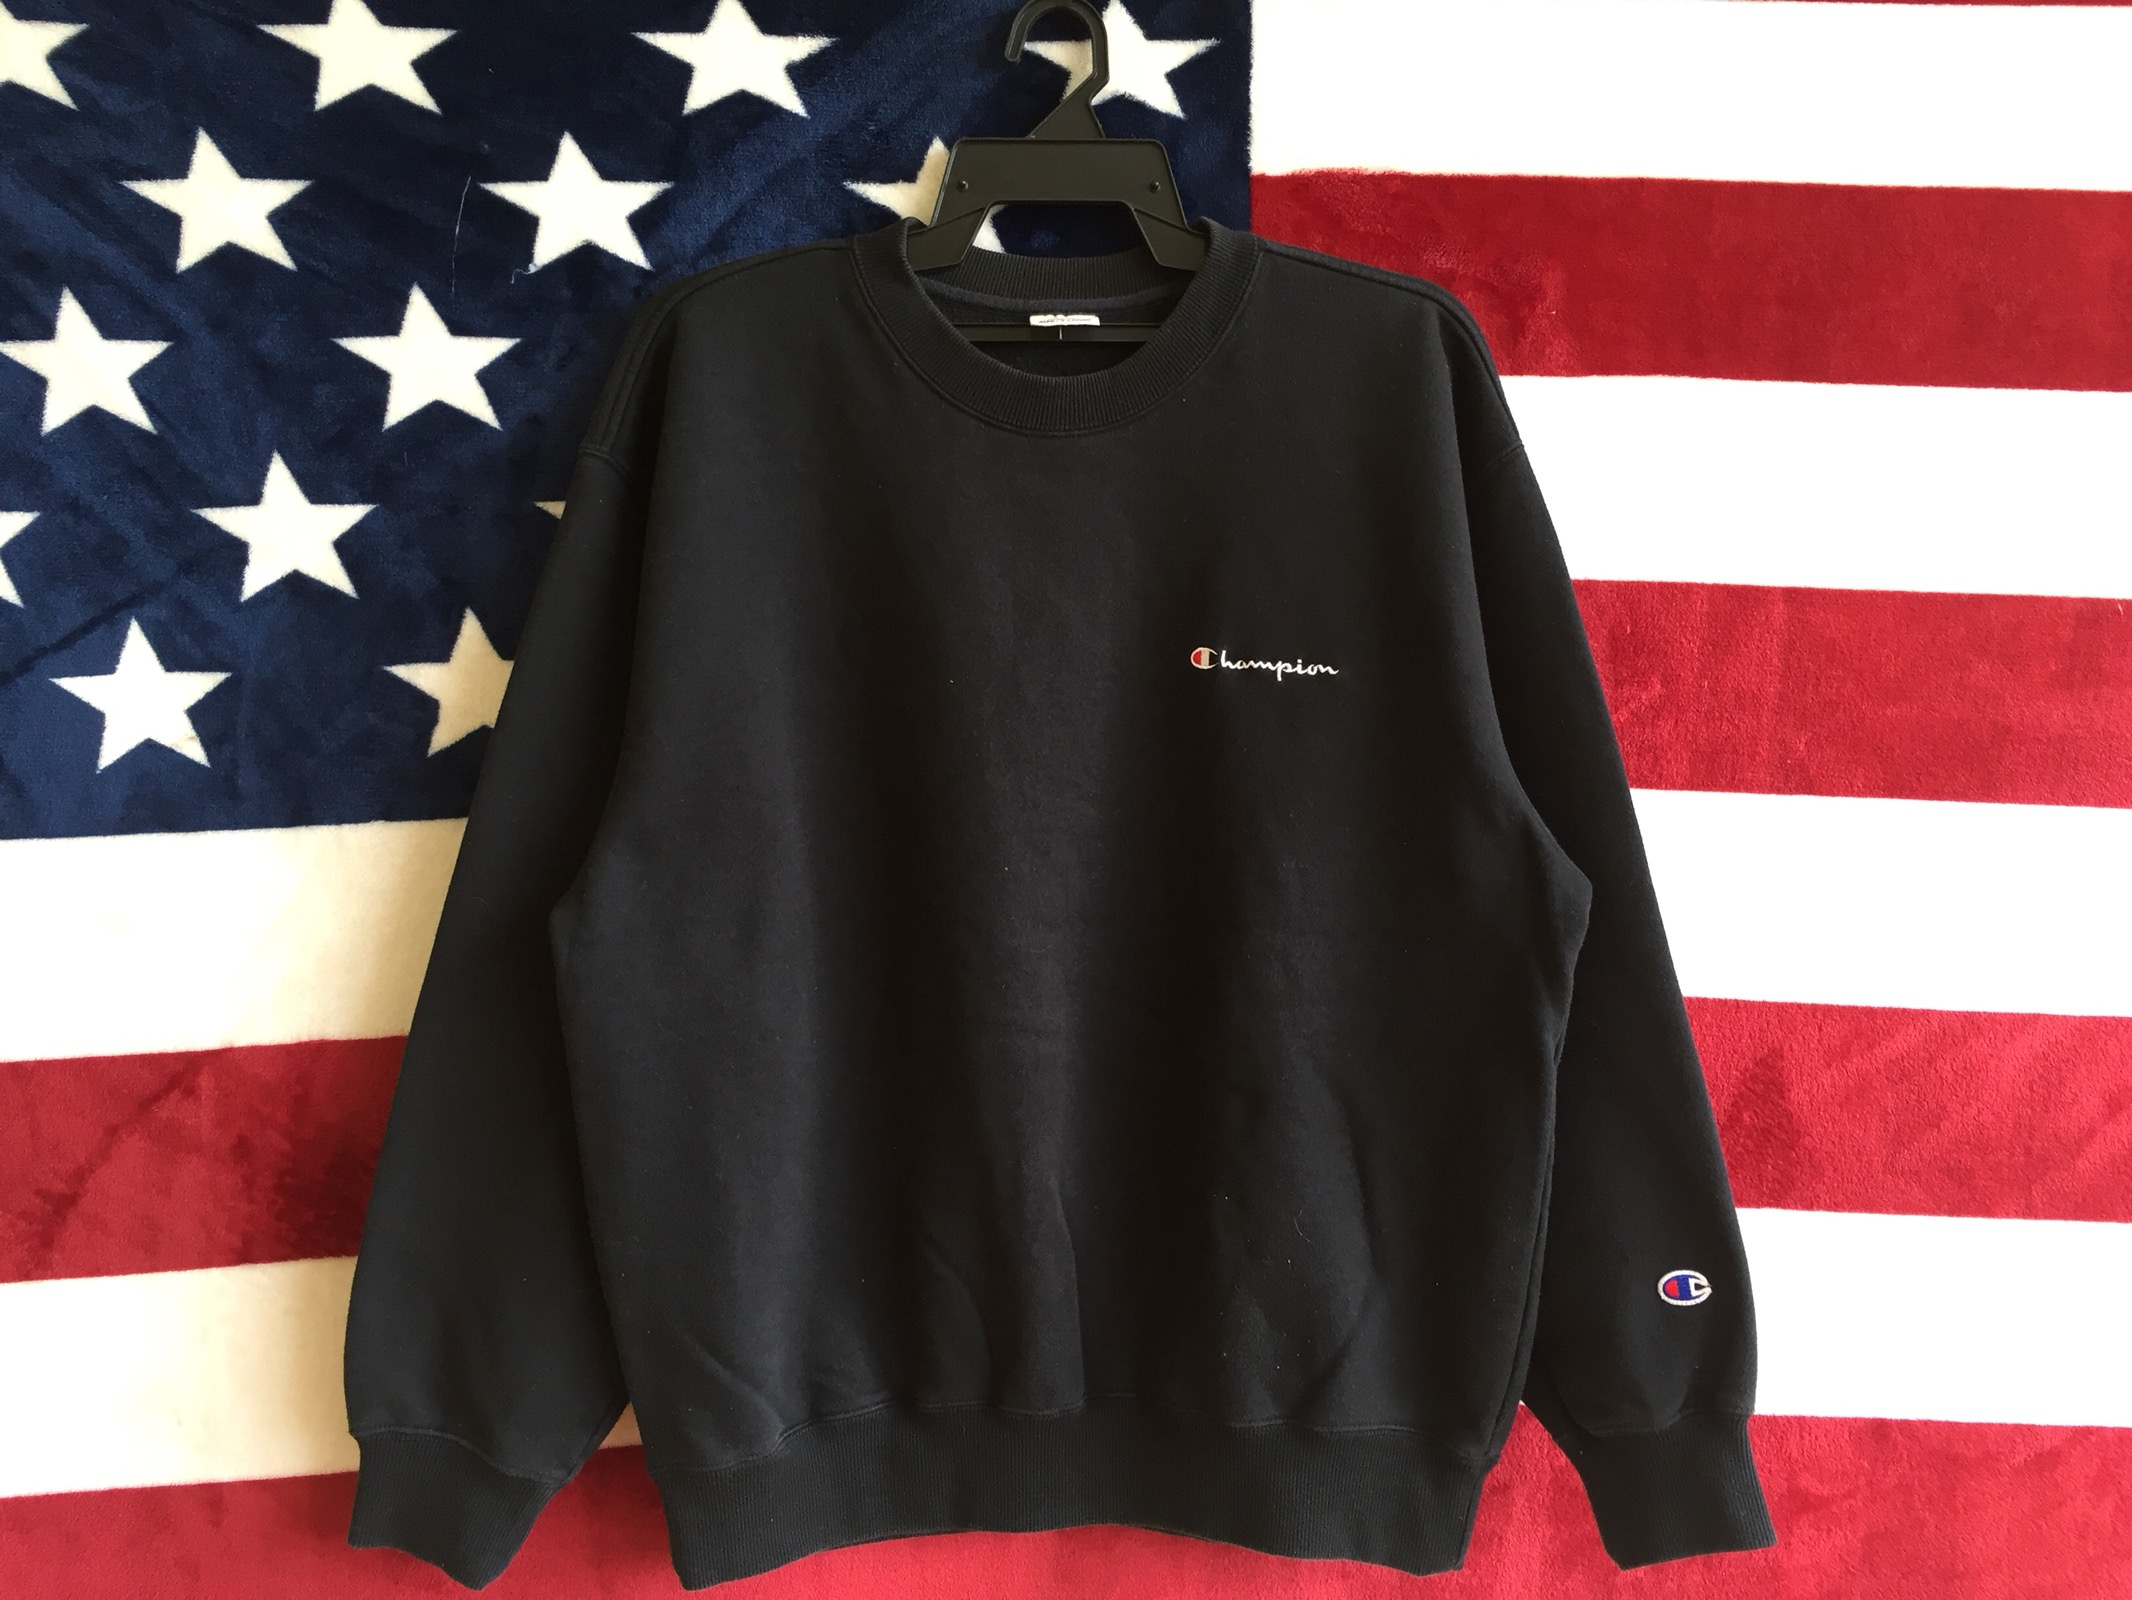 0a701a0e0a15 Champion Vintage 90s Champion Spell Out Small Logo Sweater Pullover Champion  Script Logo Sweatshirt Champion Black Colour Crewneck Large Size Size l ...